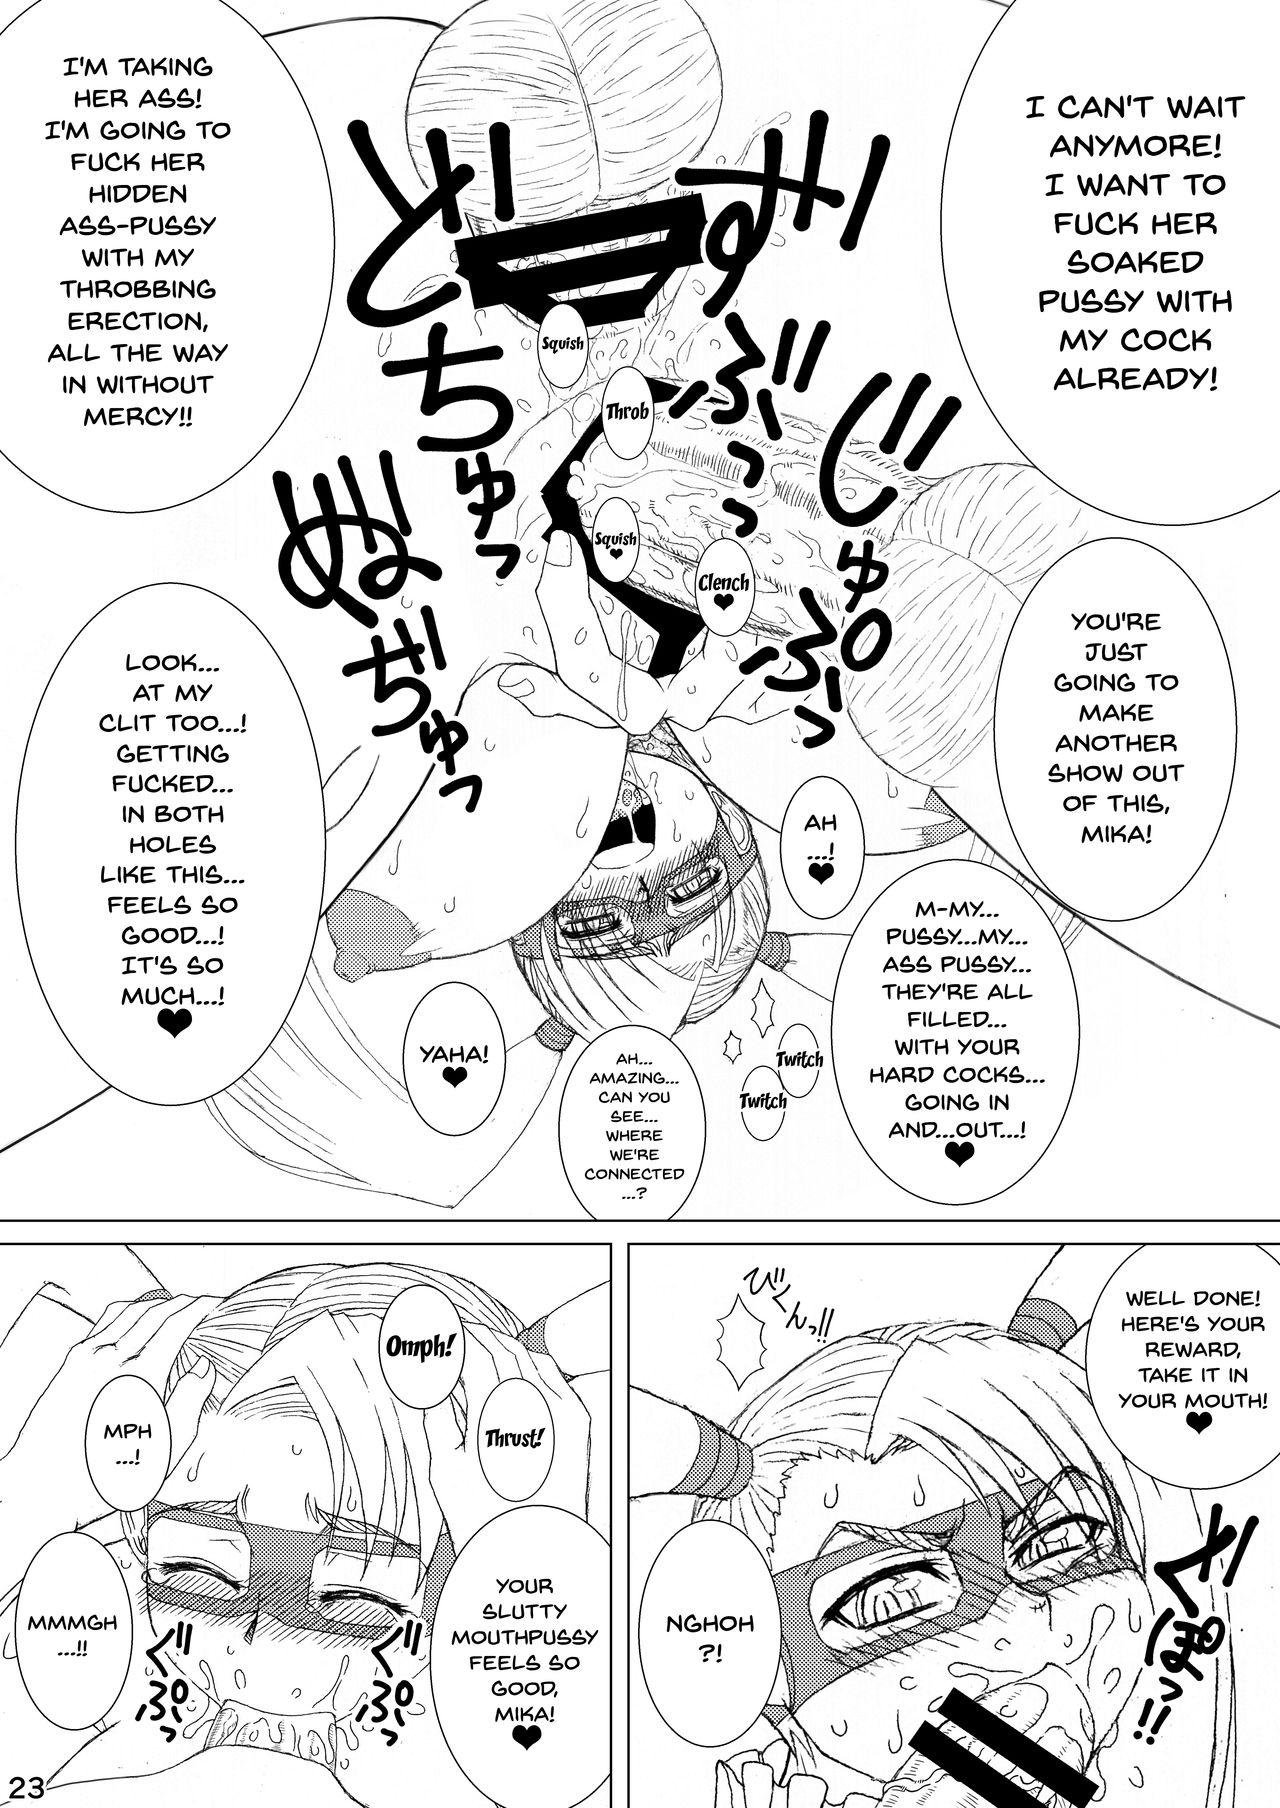 [POWERPLAY (Various)] CAPCOM (& MORE!) VS FIGHTING GIRLS Swimsuit & Gangbang Special (Various) [English] {Doujins.com} [Digital] 19